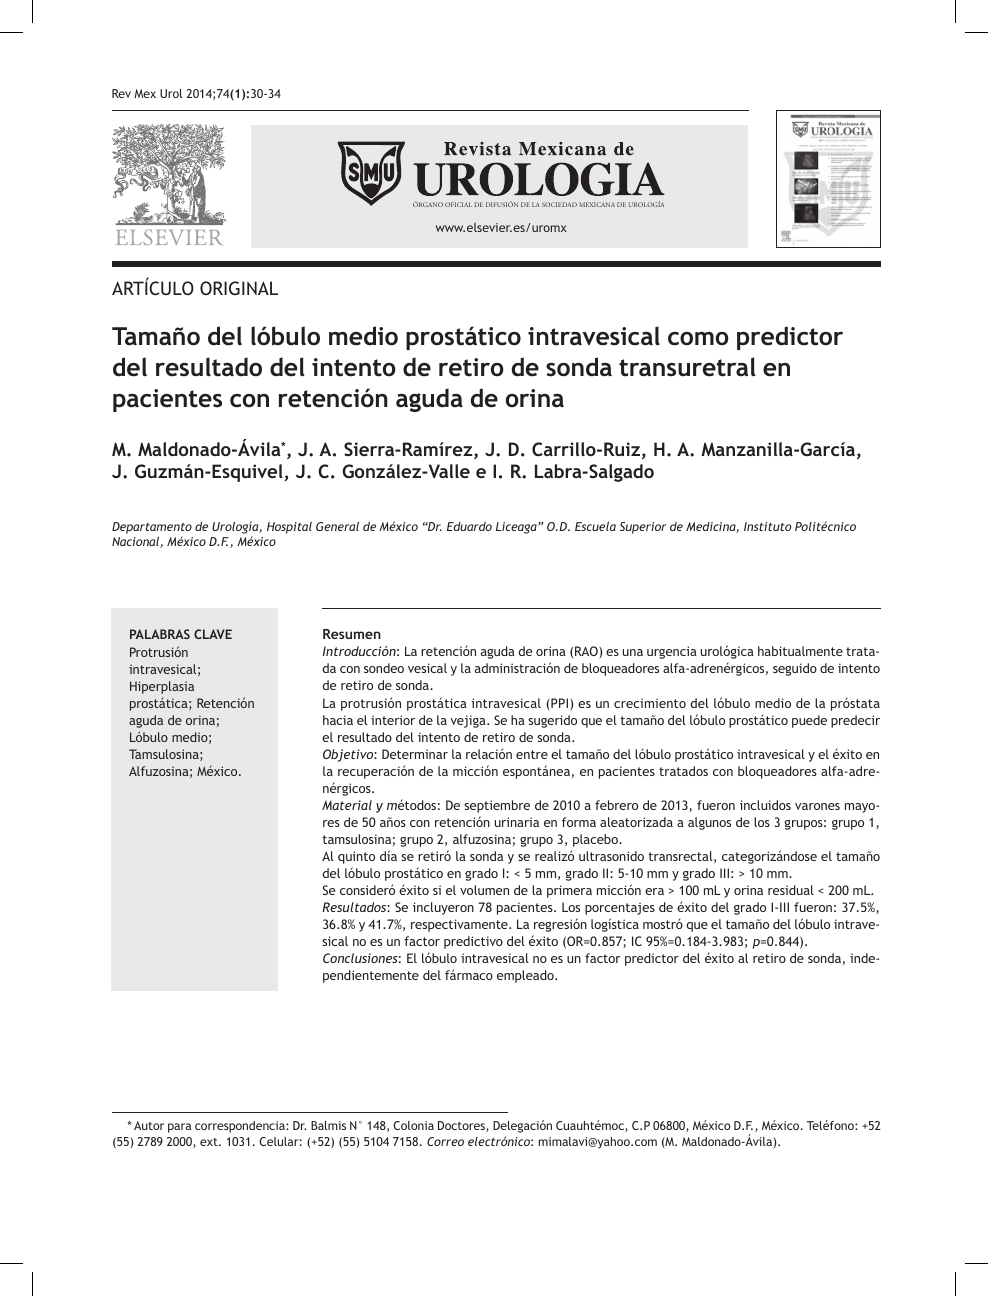 fórmula de volumen de hiperplasia del tamaño de la próstata